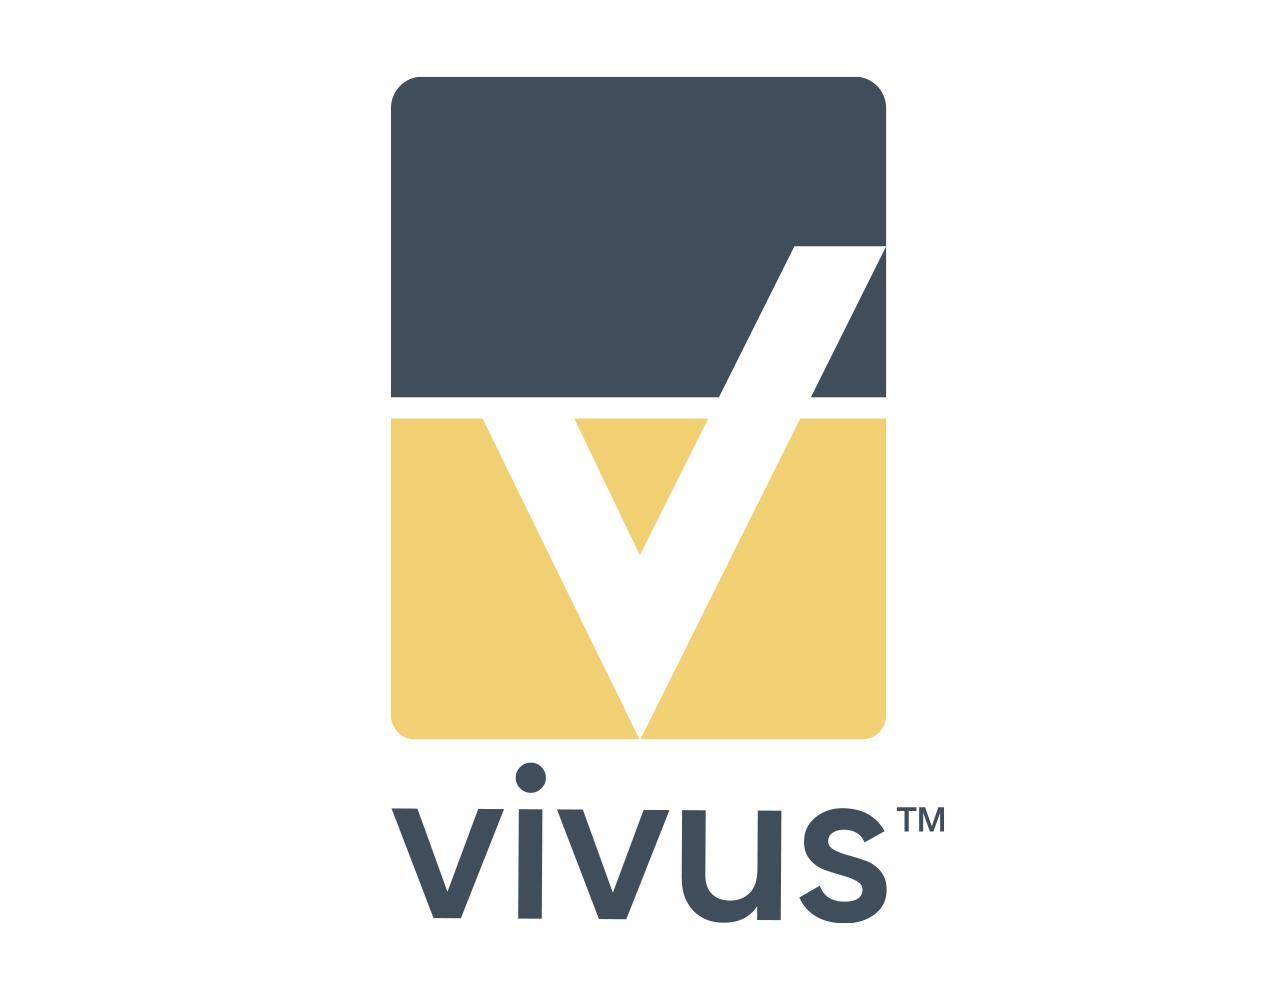 Vivus Identity logo